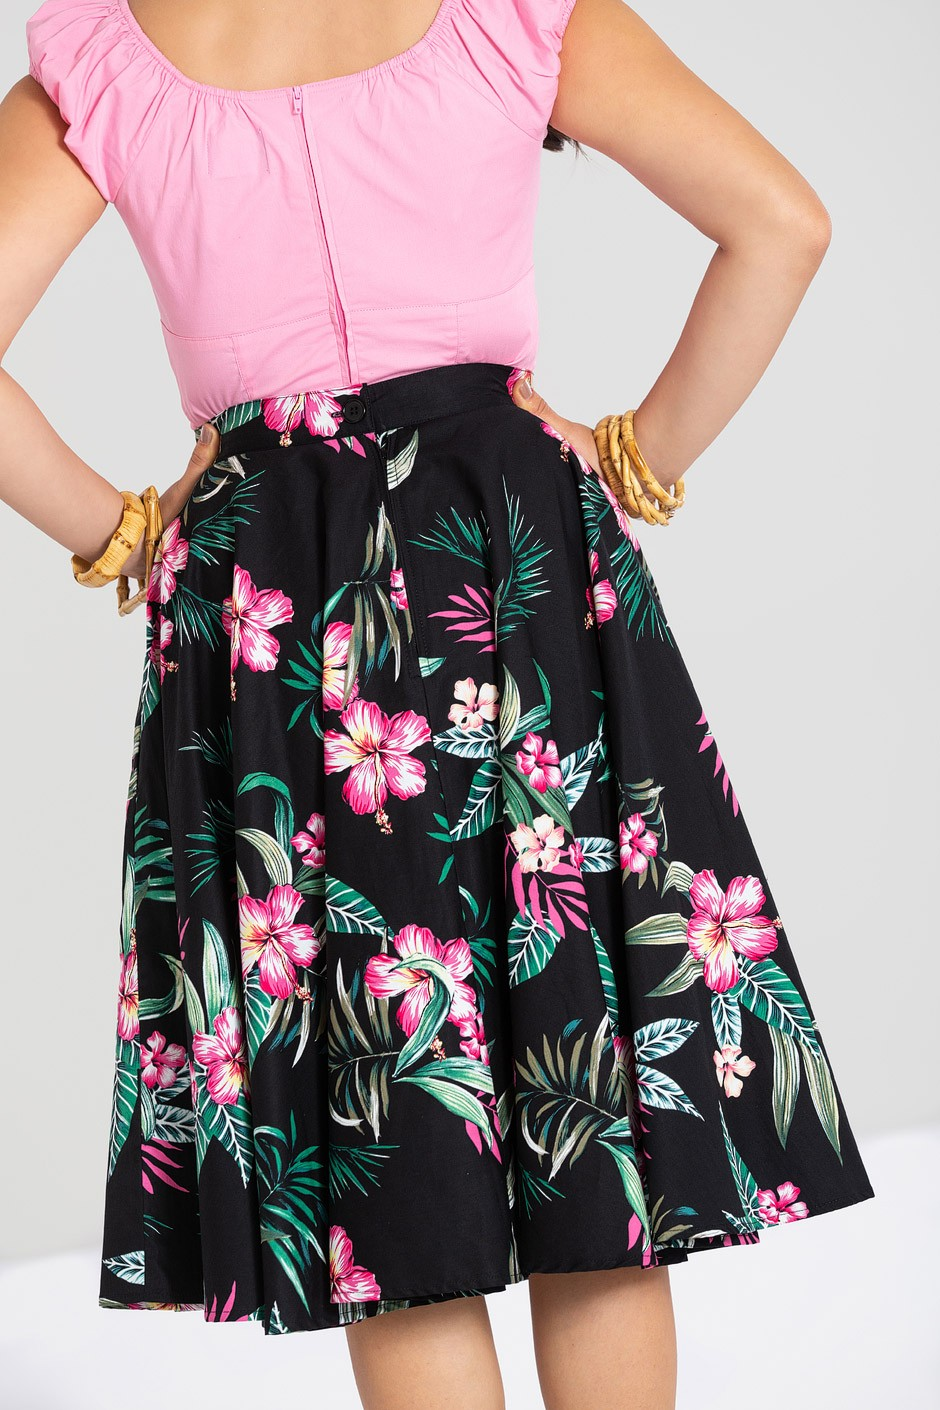 kalani kjol, svart, bak